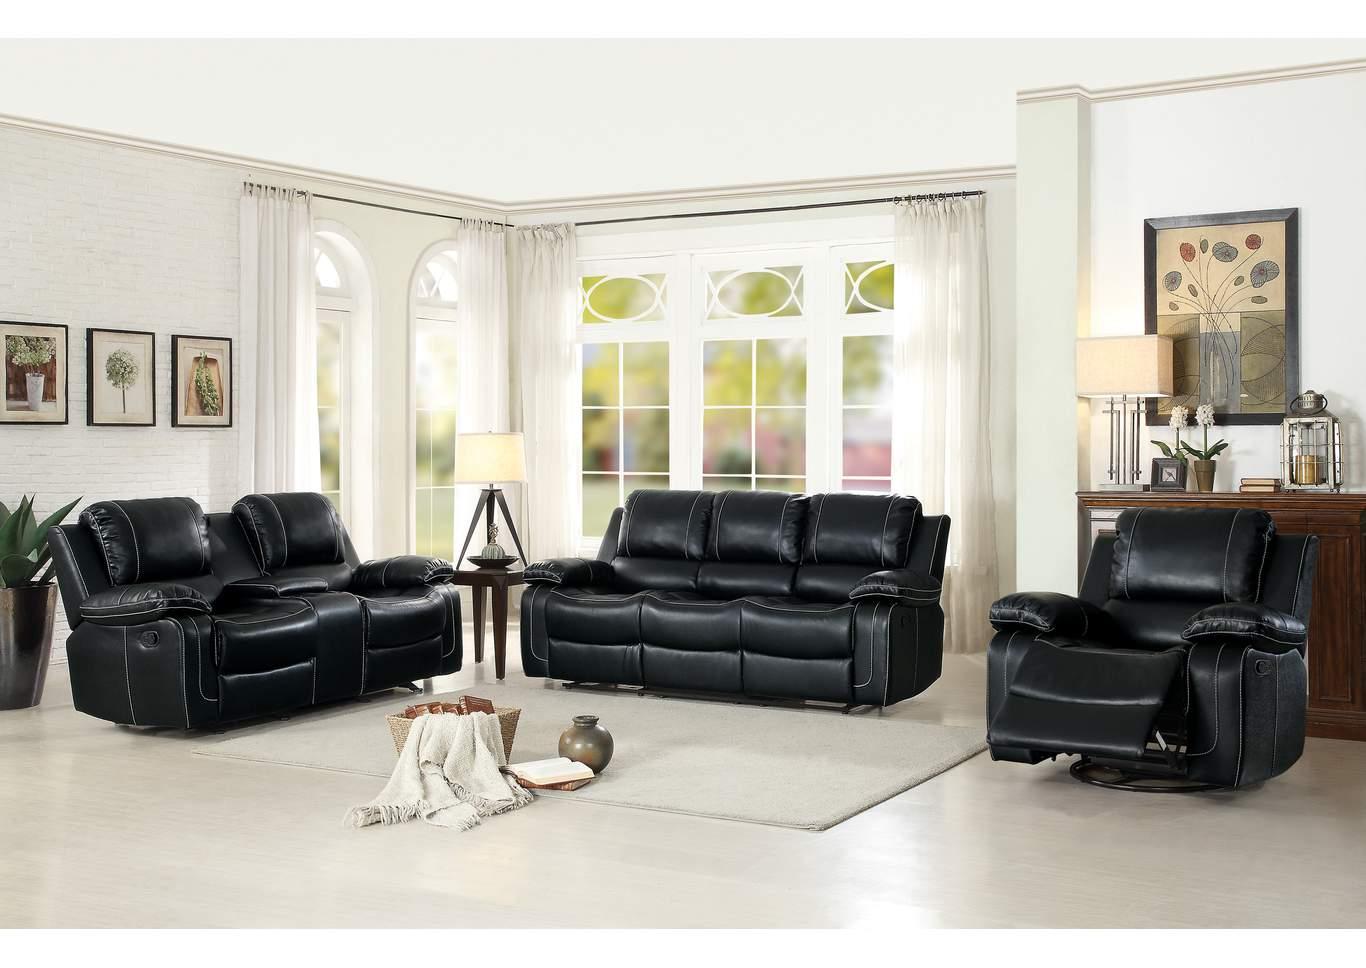 Pleasing Trumbull Furniture Trumbull Kids Double Glider Reclining Uwap Interior Chair Design Uwaporg